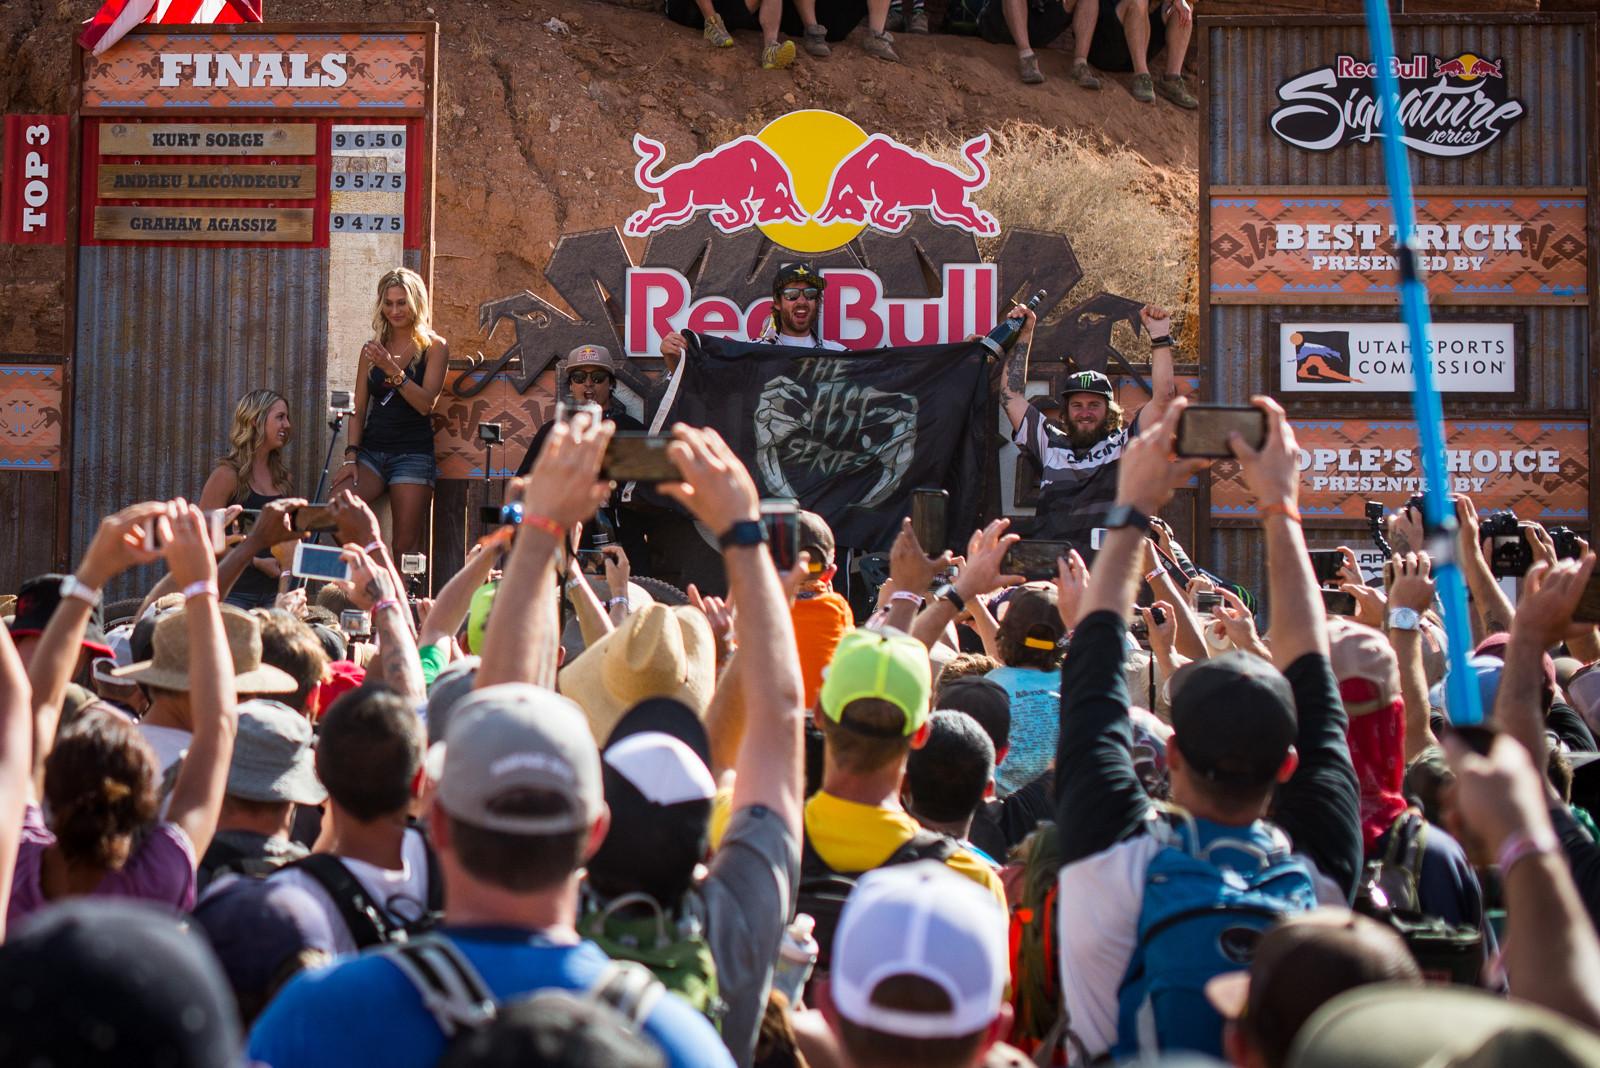 2015 Rampage Podium - 2015 Red Bull Rampage Finals - Mountain Biking Pictures - Vital MTB